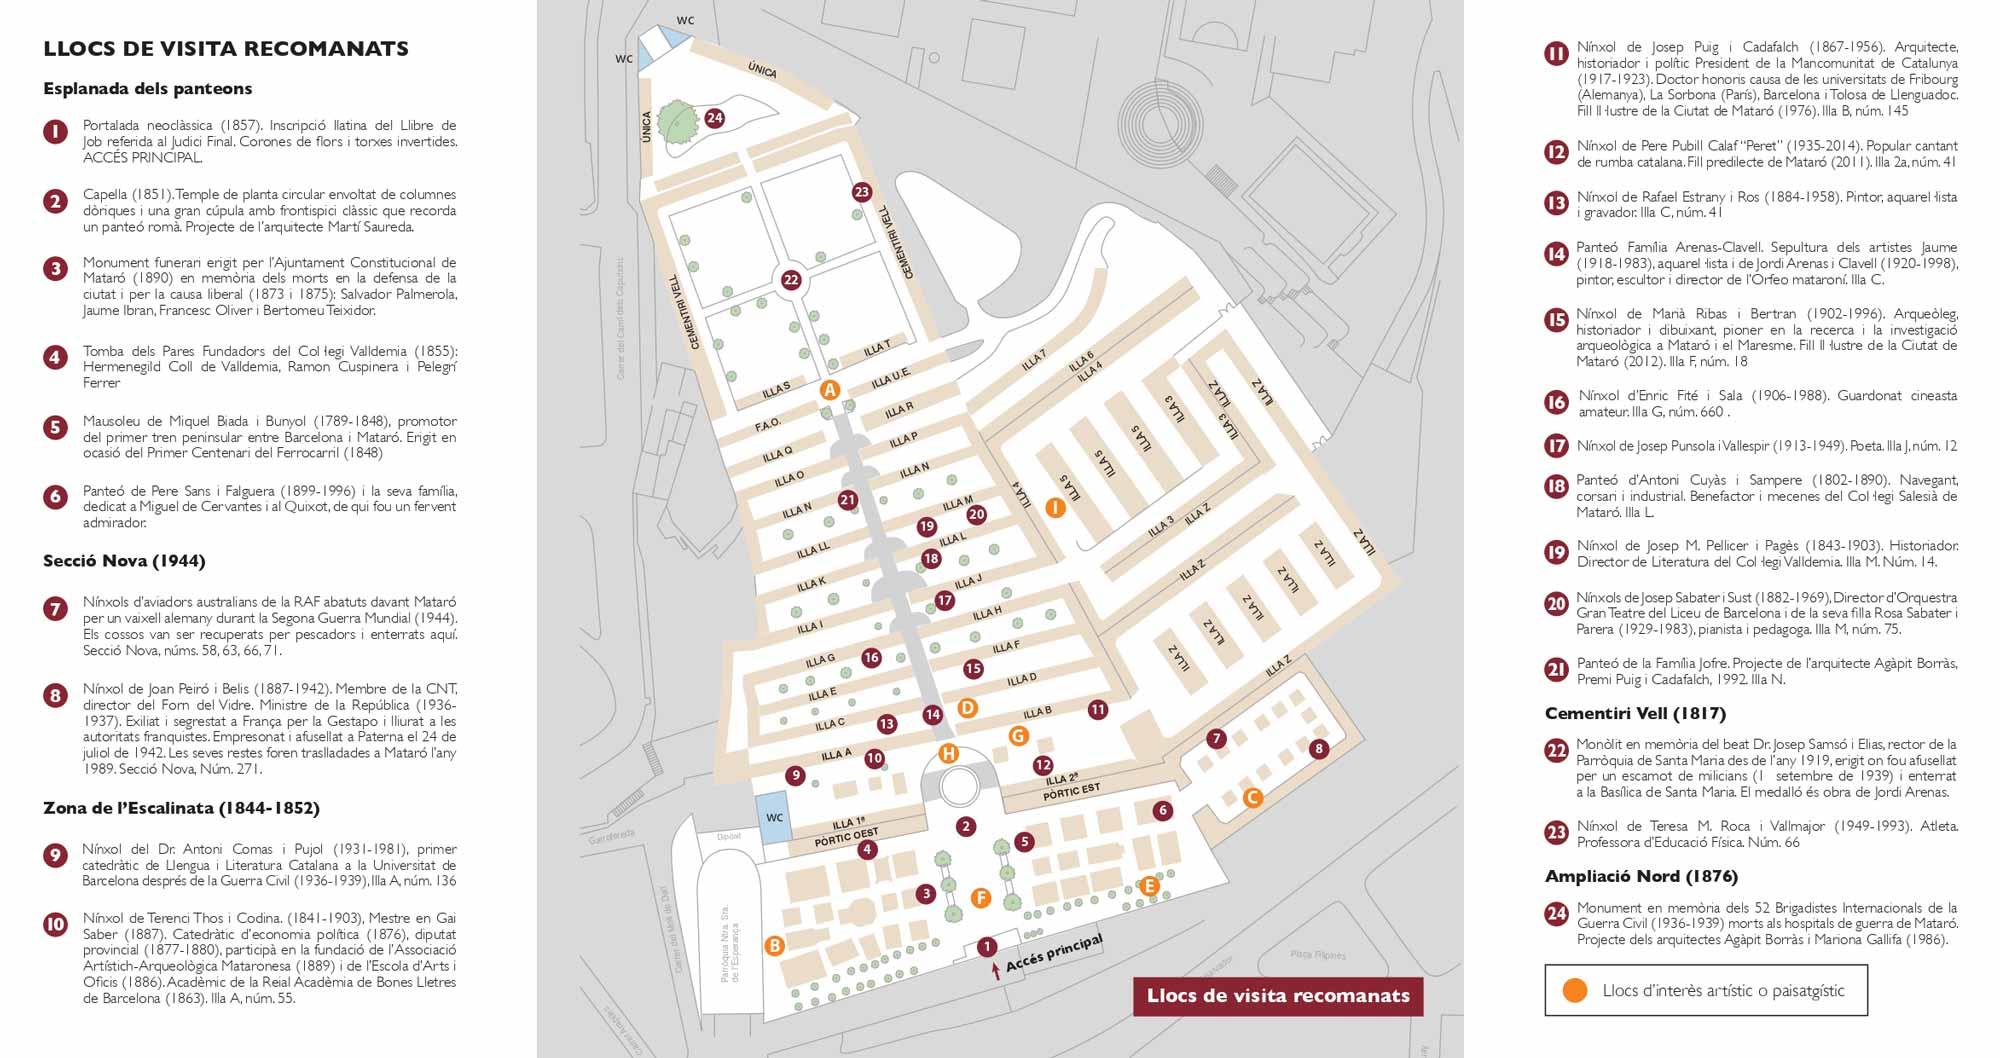 Mapa del cementerio de Mataró